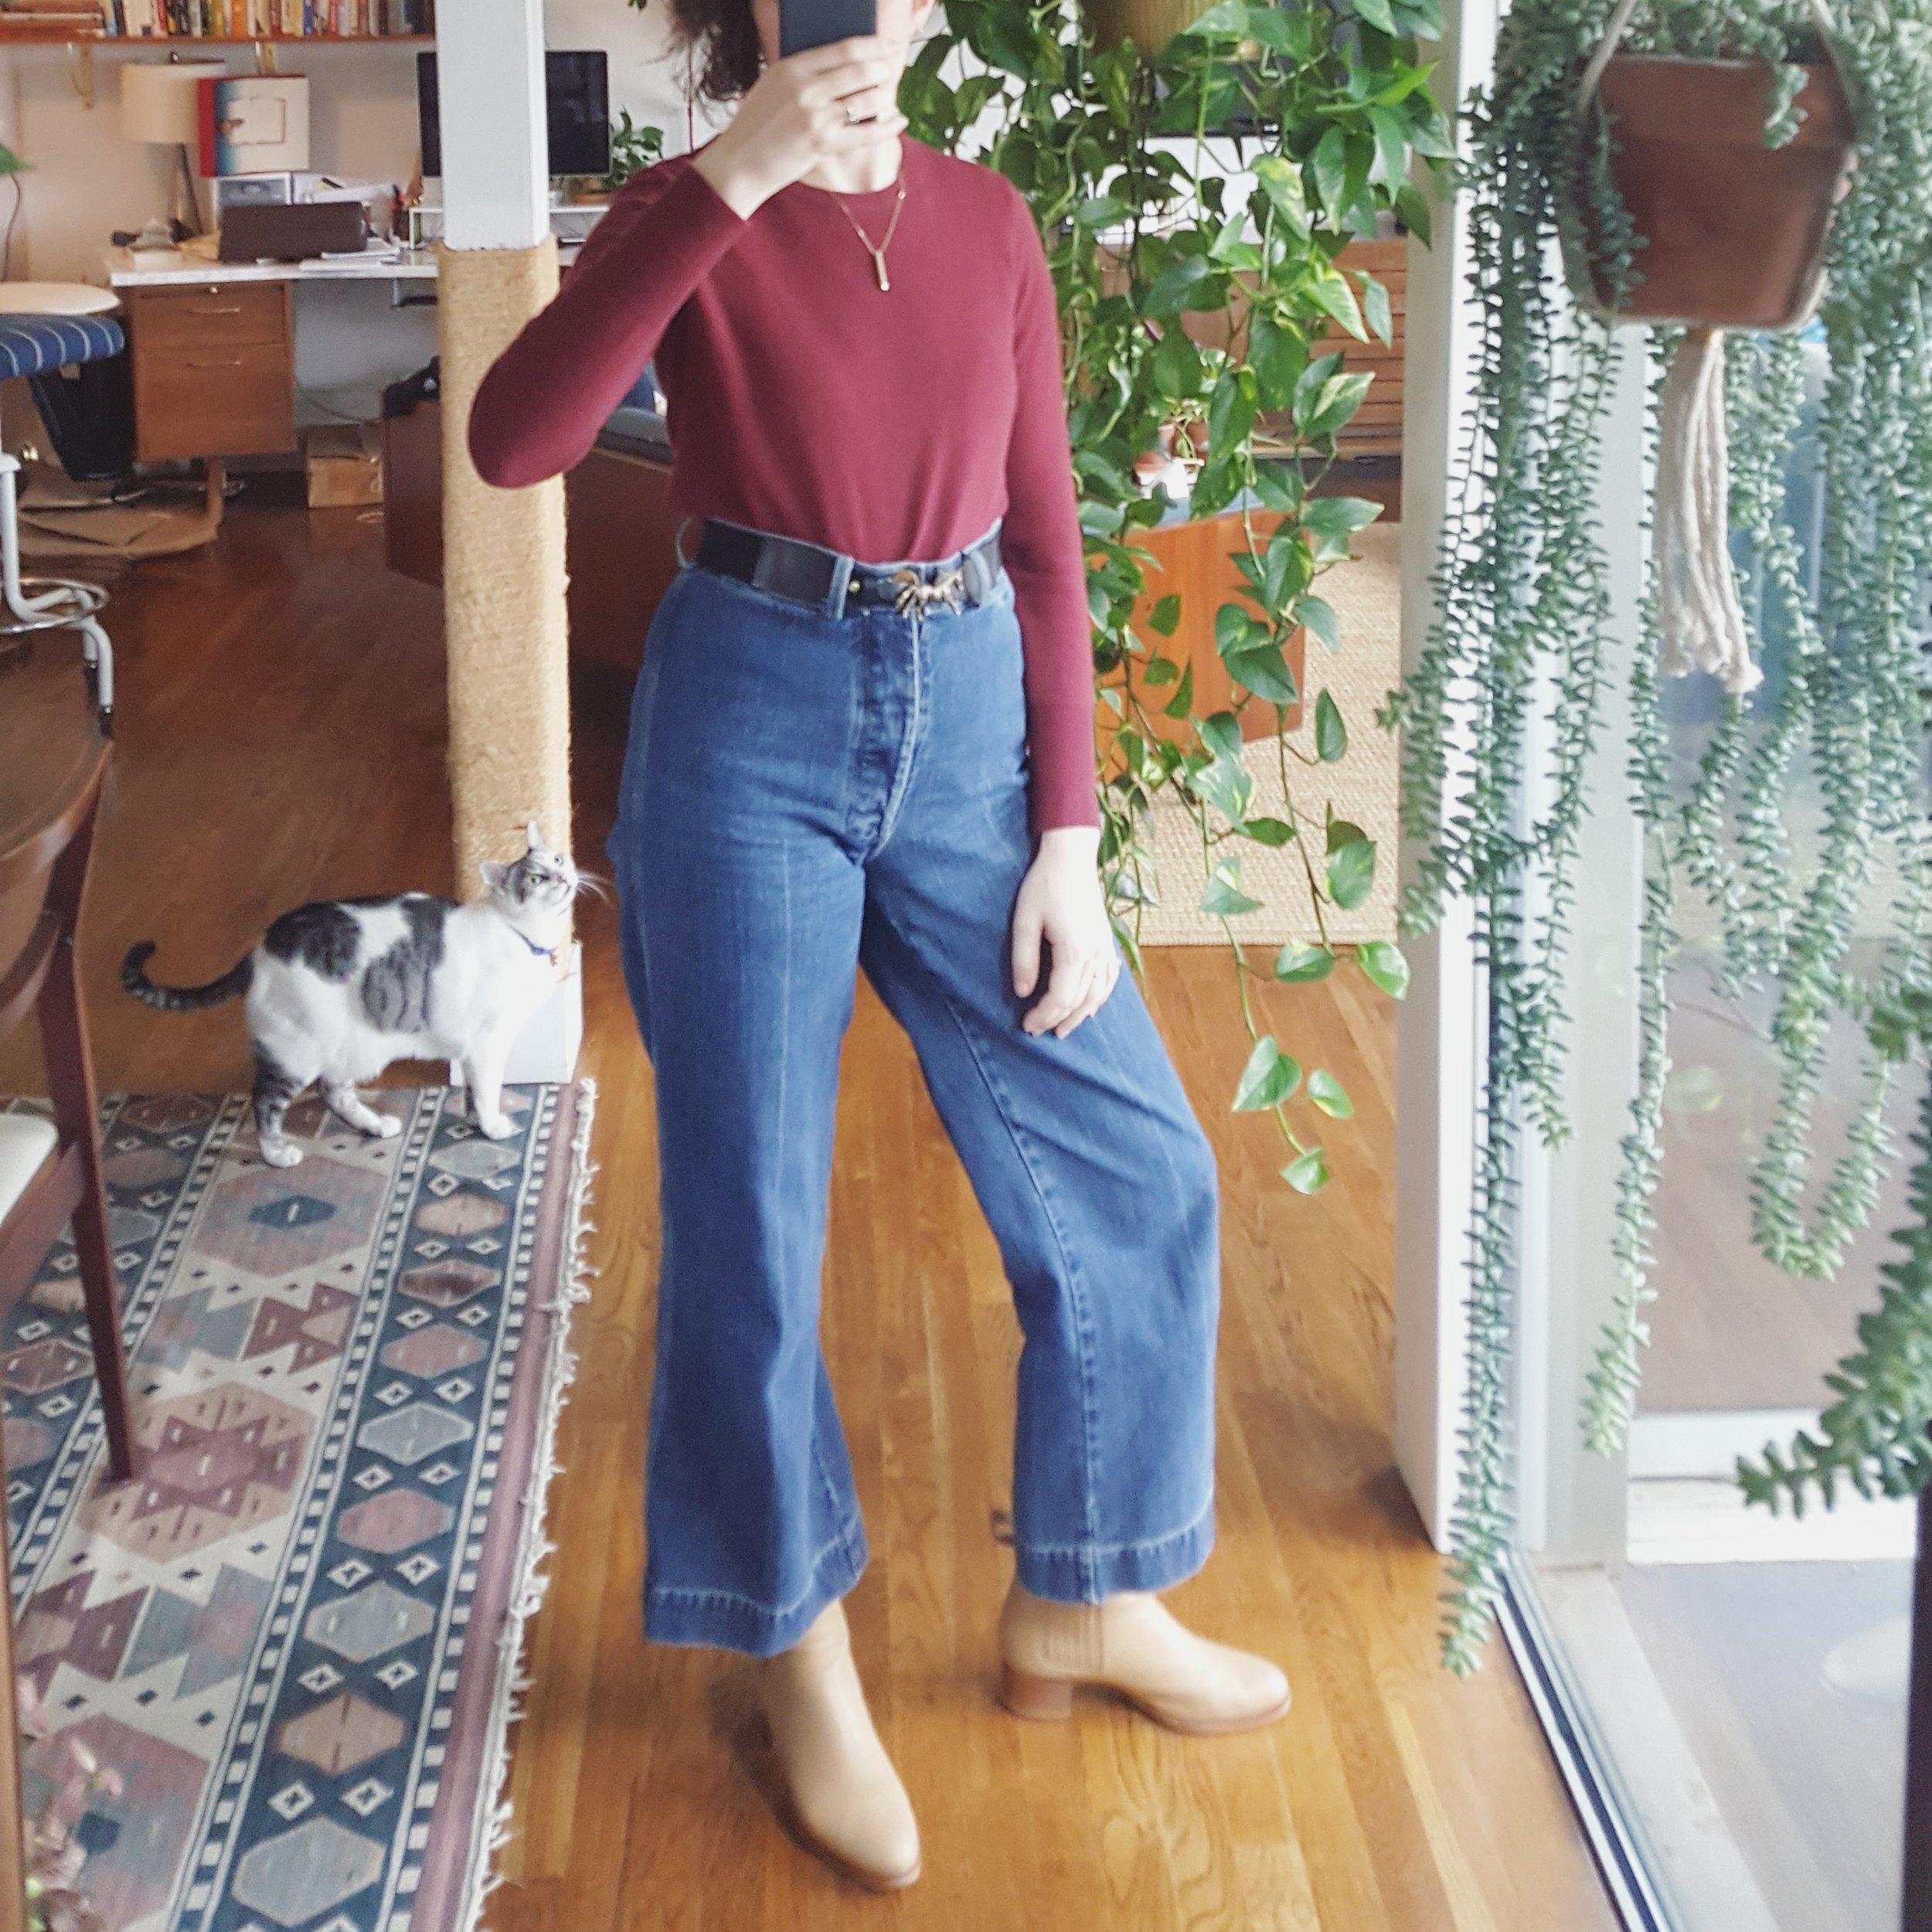 Sunday - December 31, 2017Caron Callahan jeans + Everlane sweater + Veronique Branquinho boots